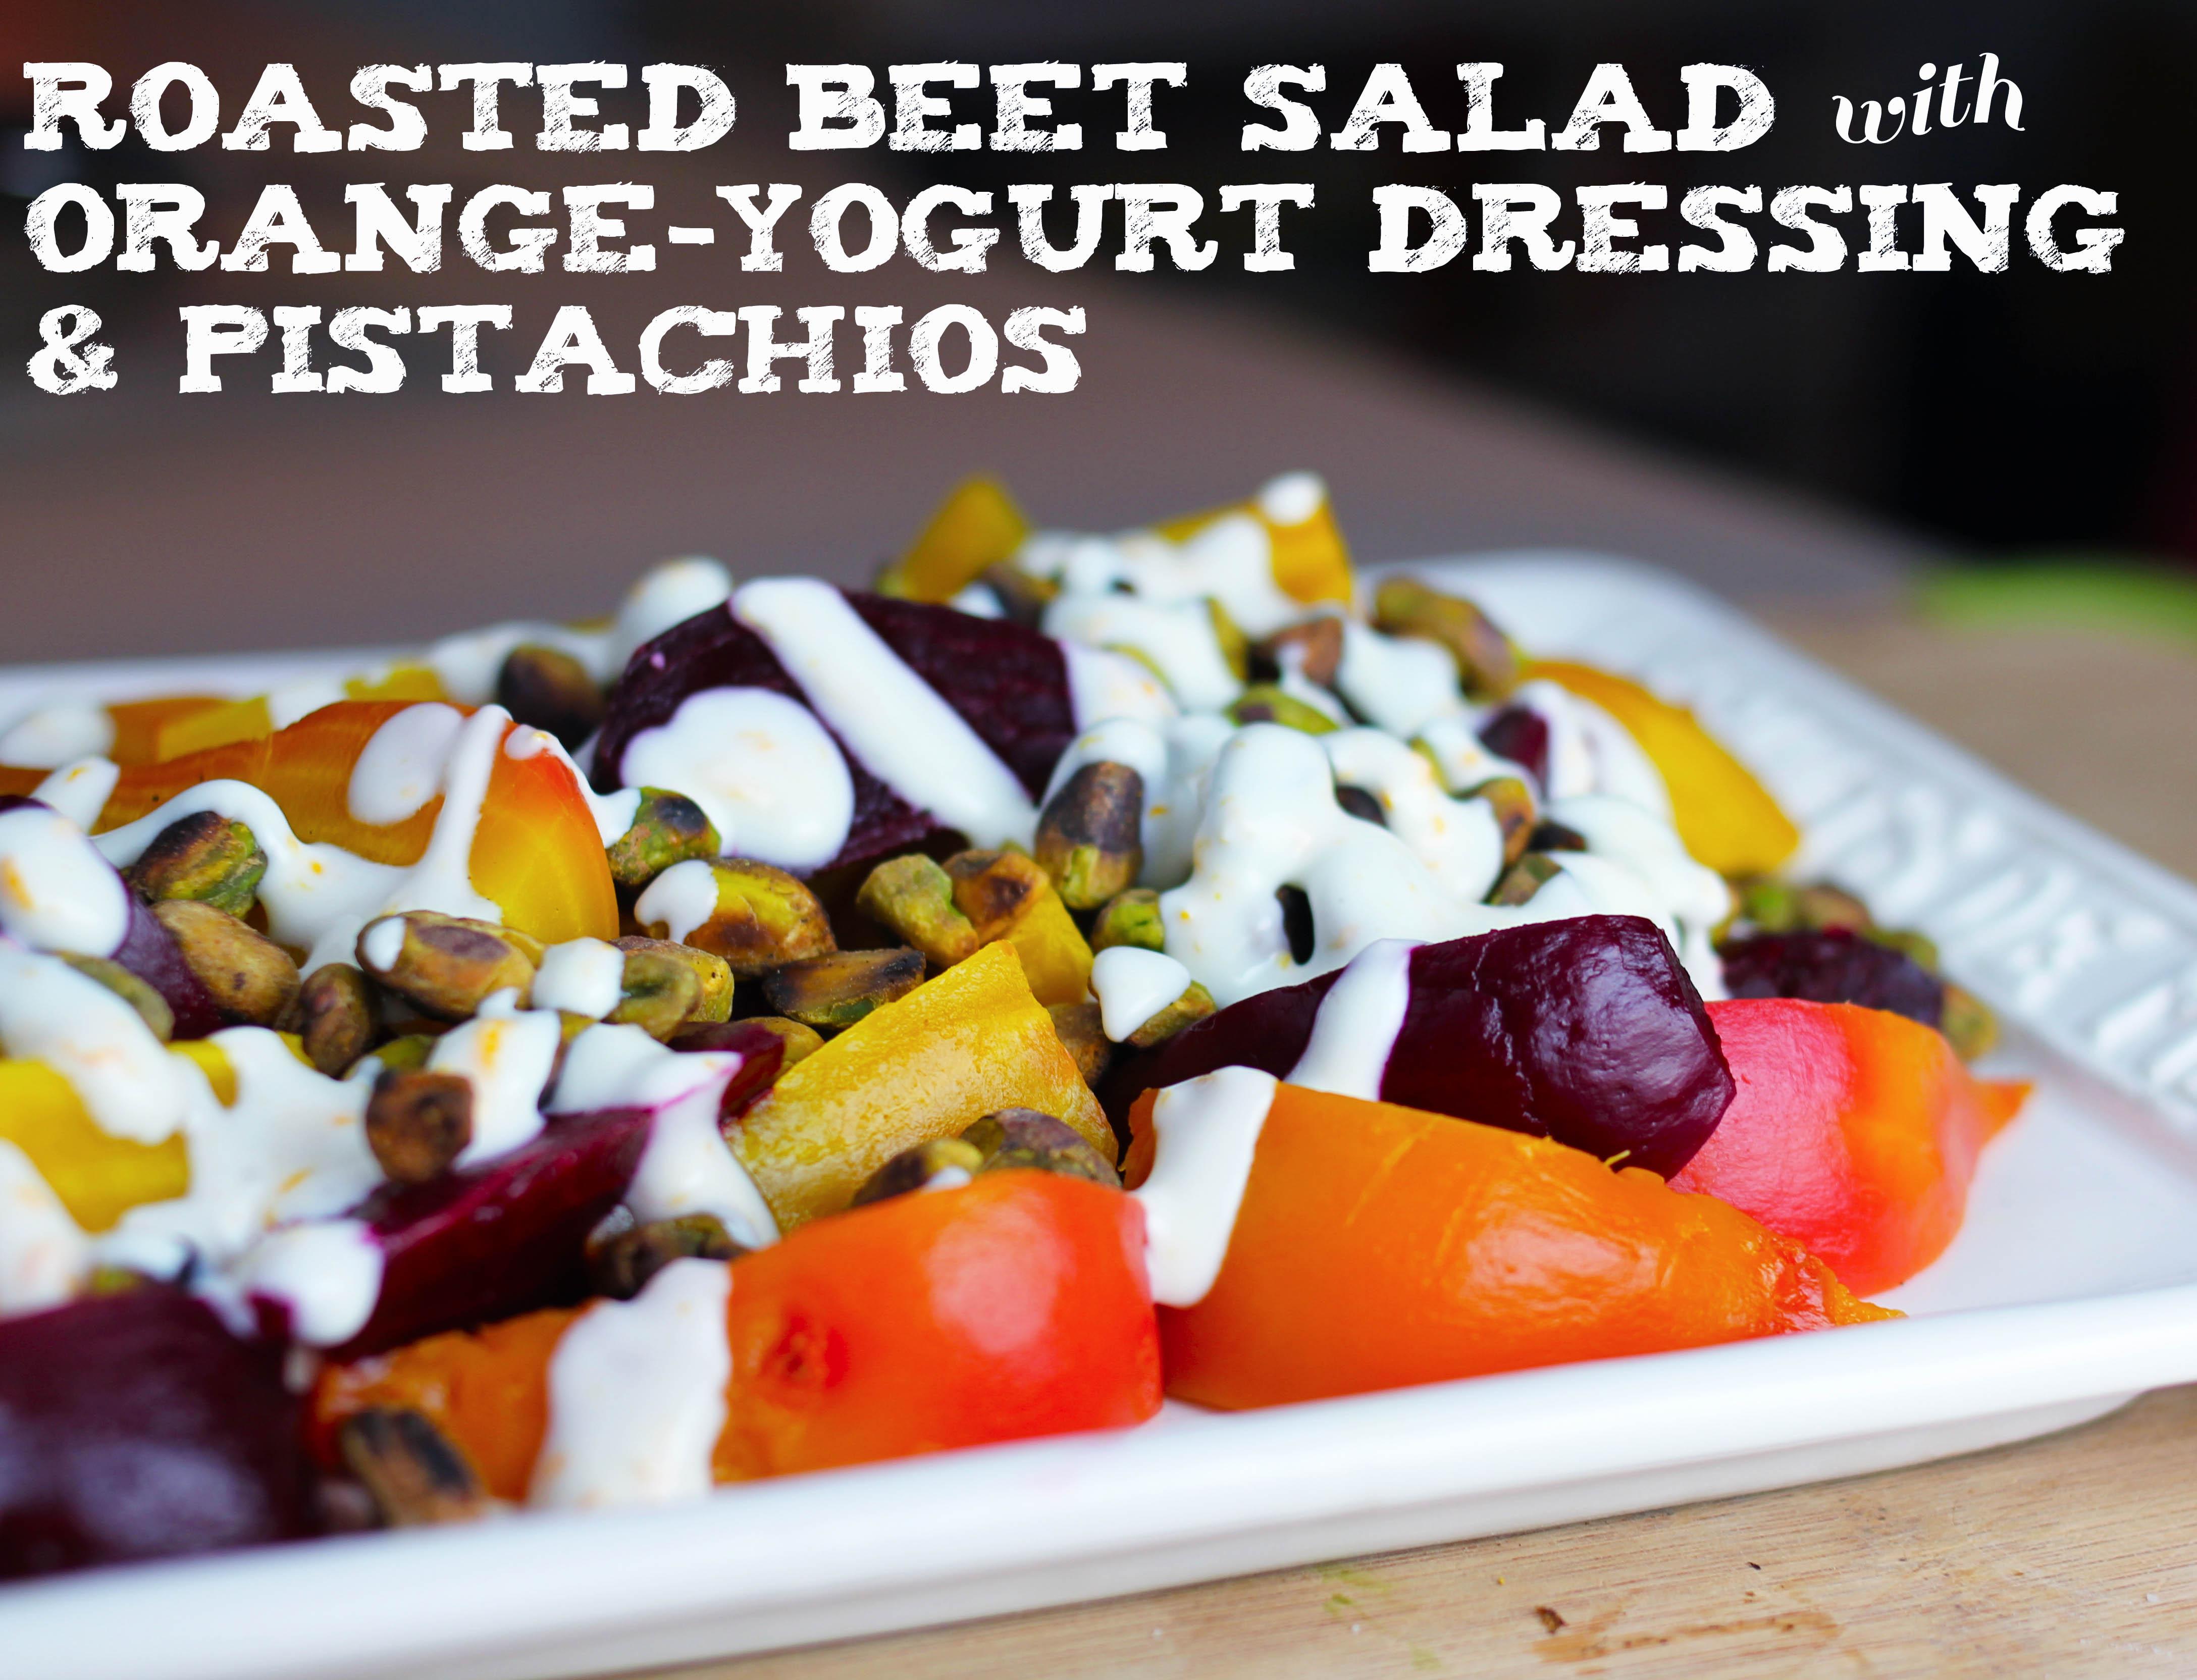 ... beet salad salad beet strawberry and orange beet strawberry and orange